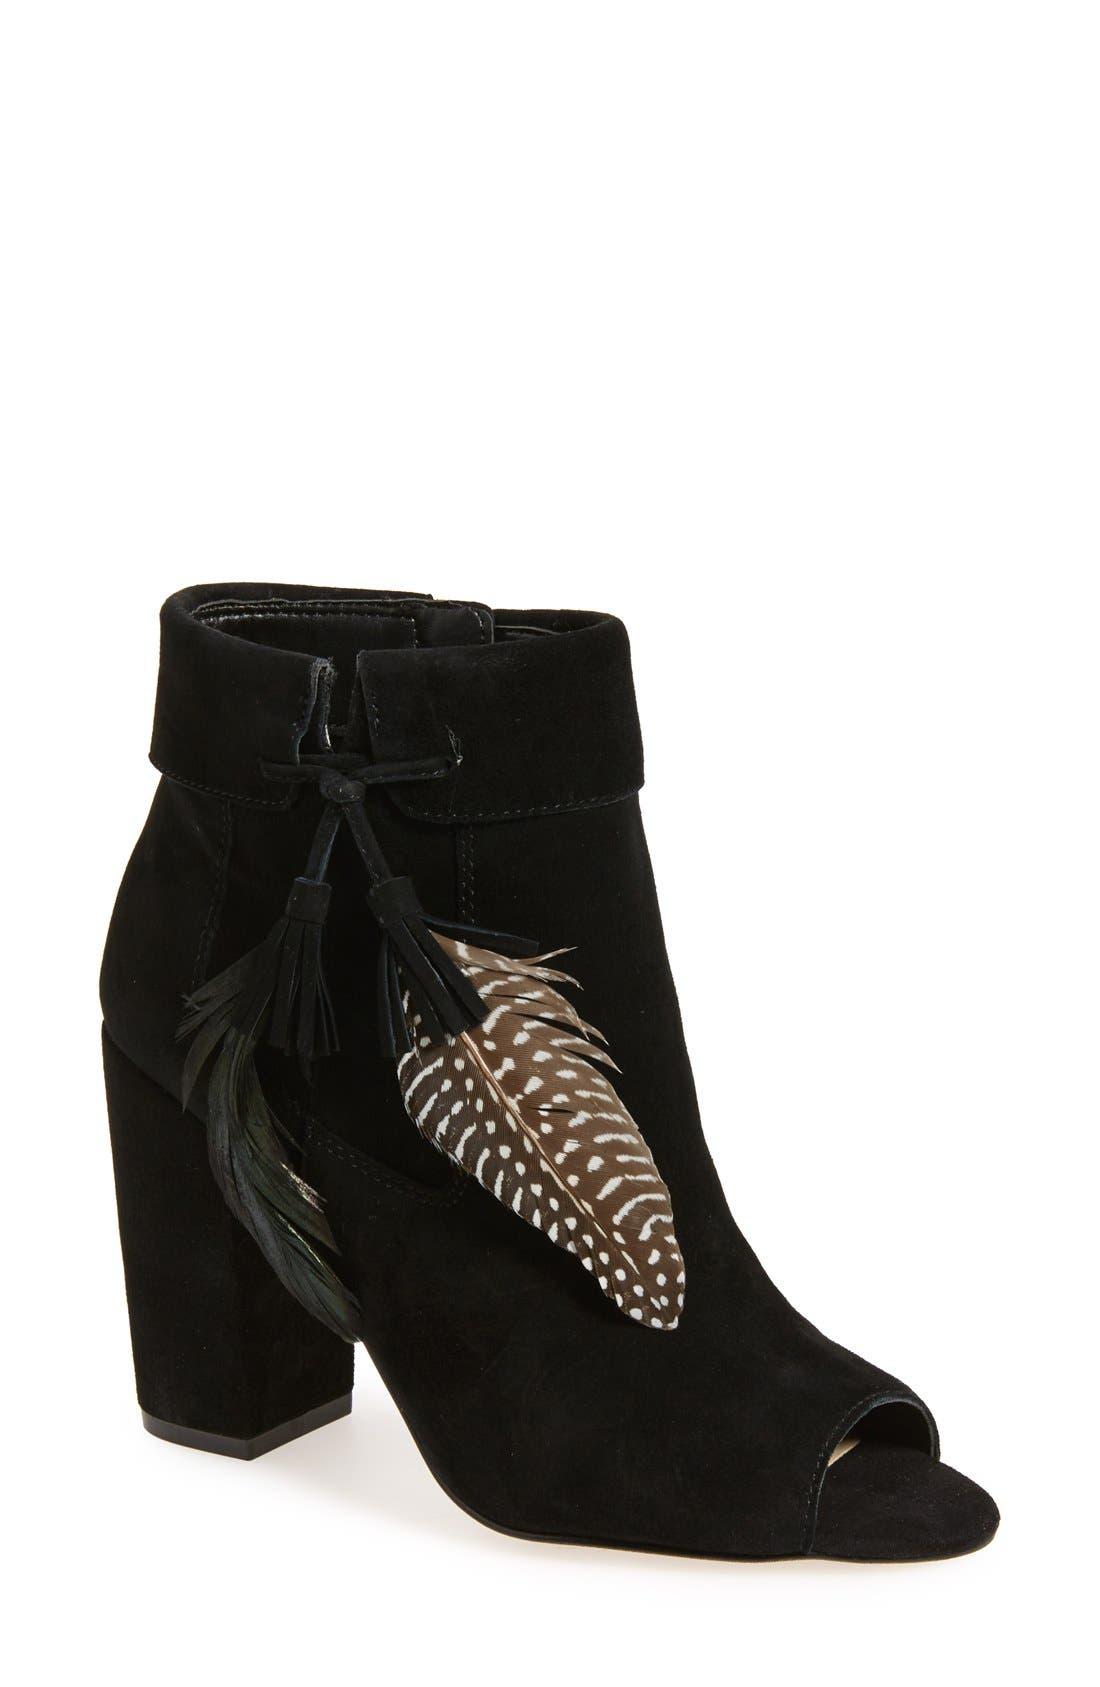 Main Image - Jessica Simpson 'Kailey' Feather Charm Peep Toe Bootie (Women)